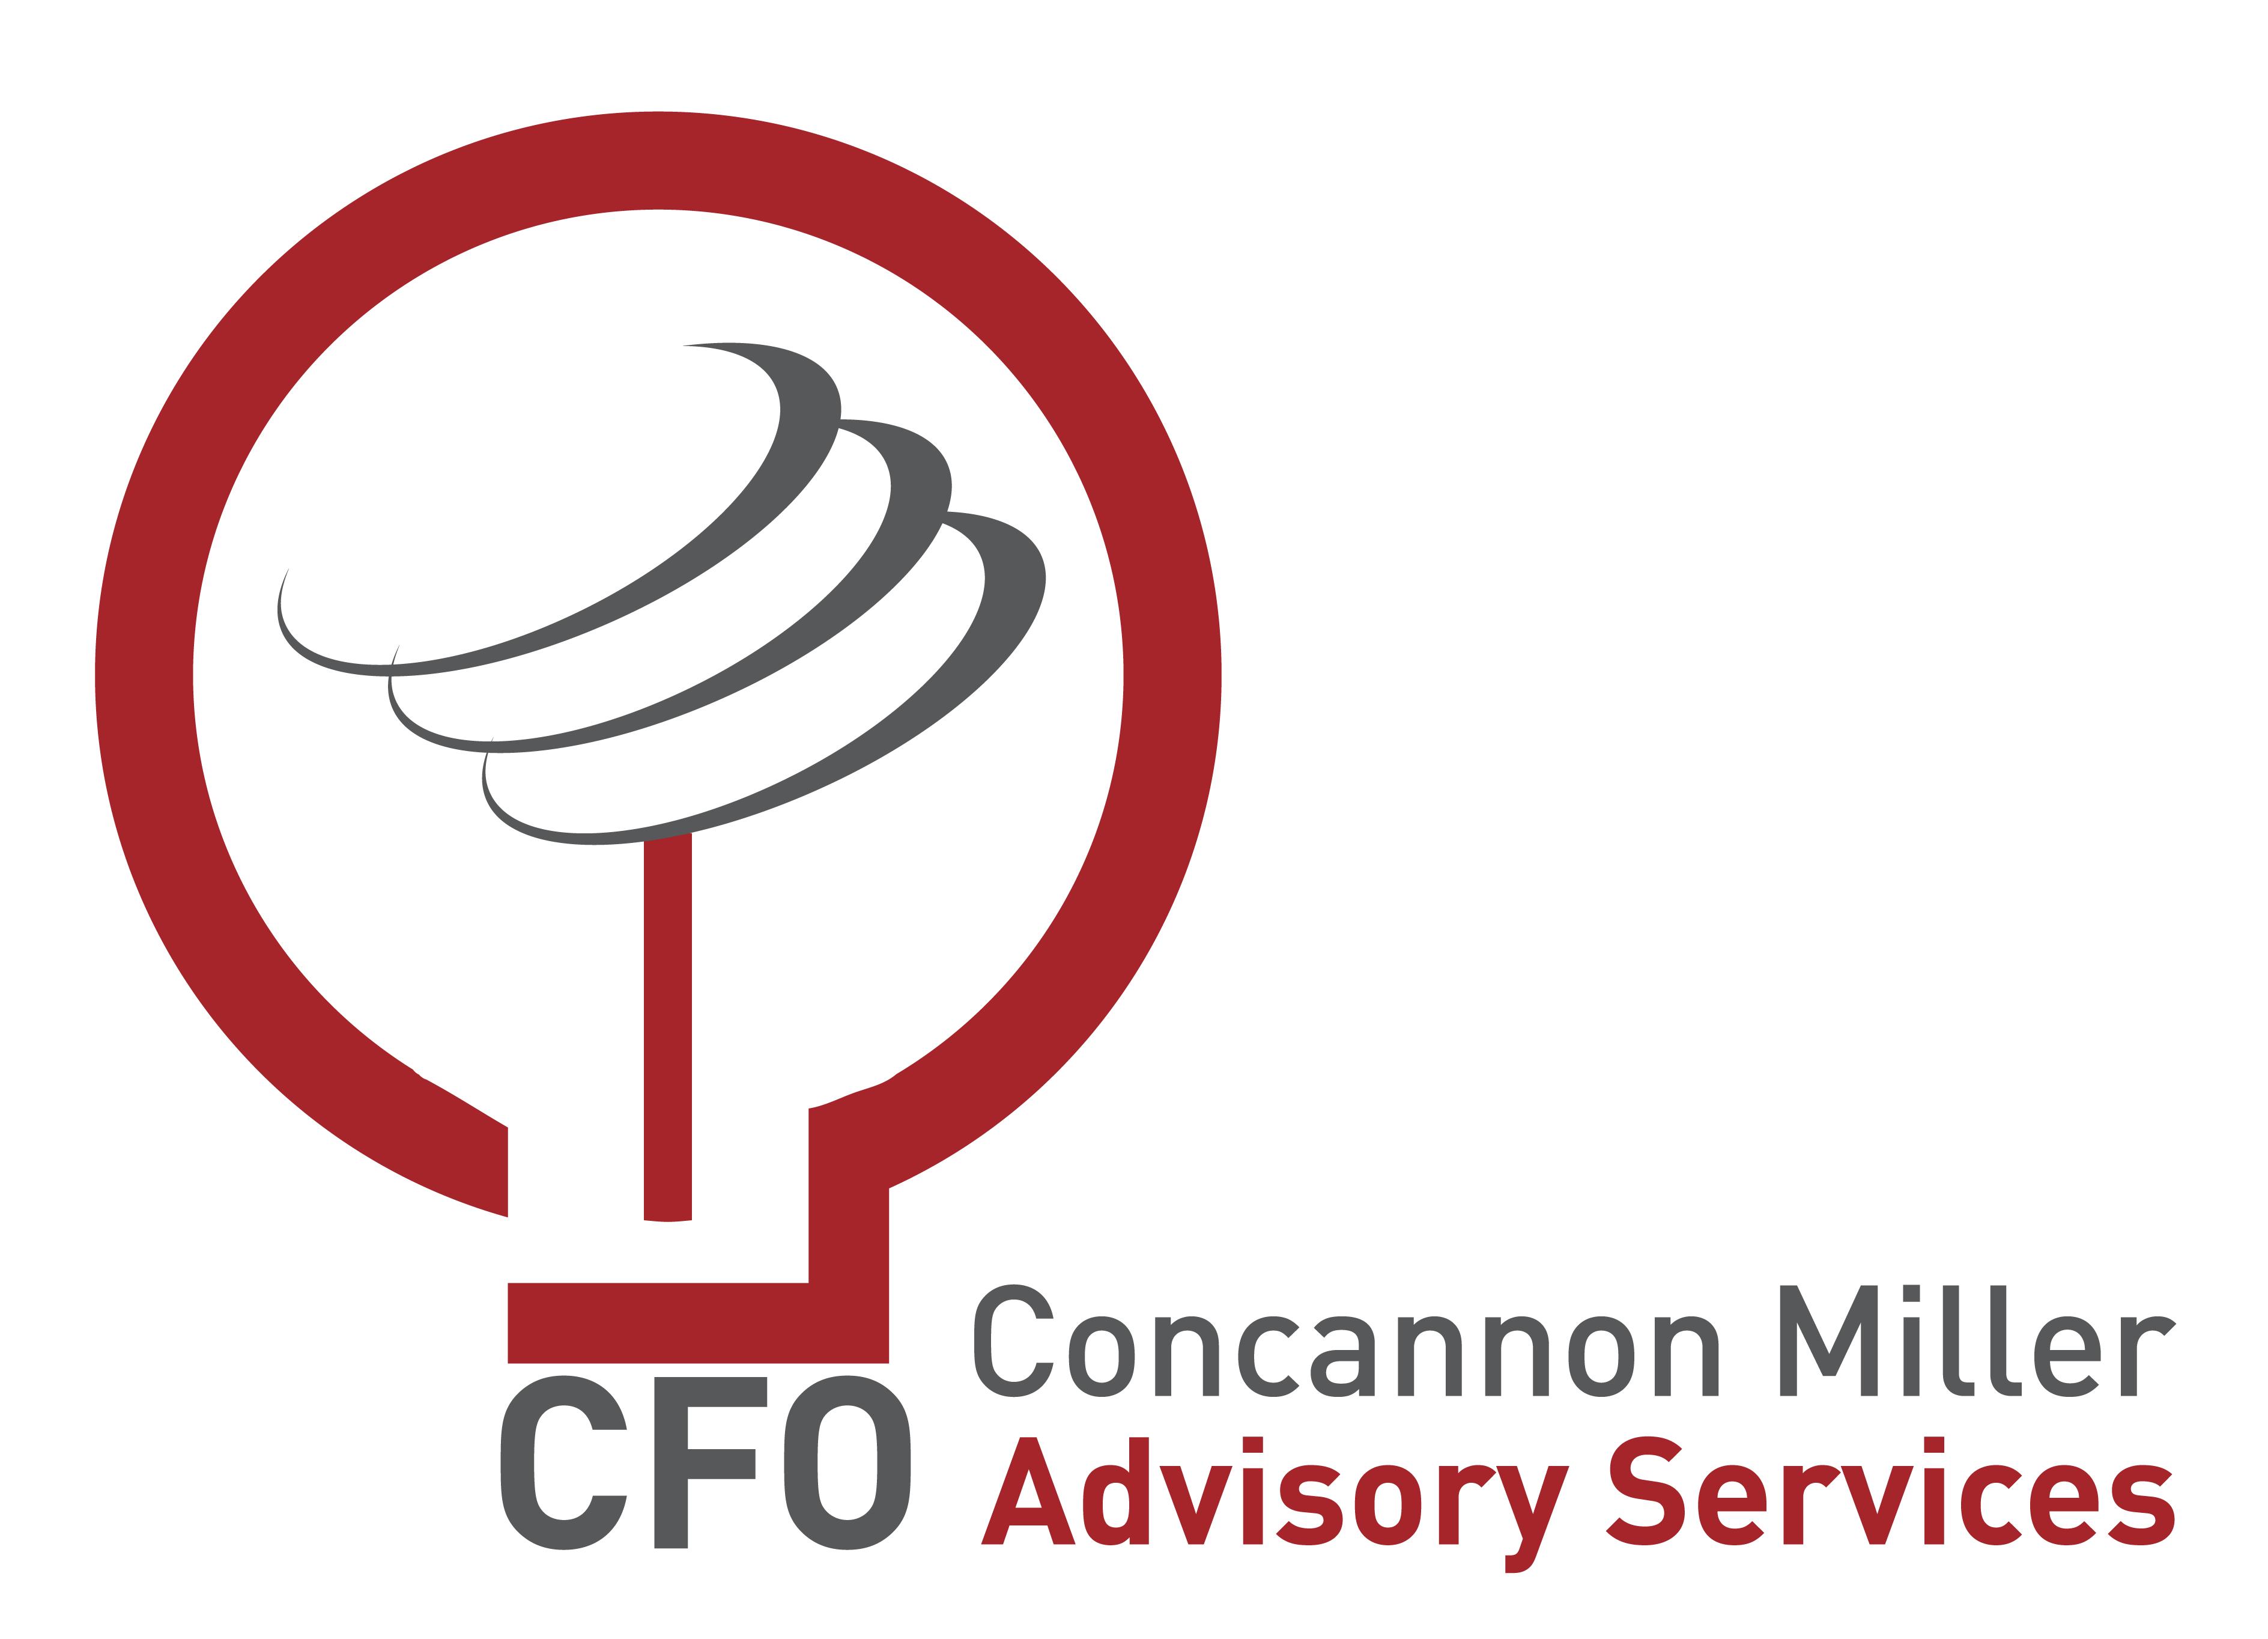 CFO_Advisory_Services_logo-version2_2.png